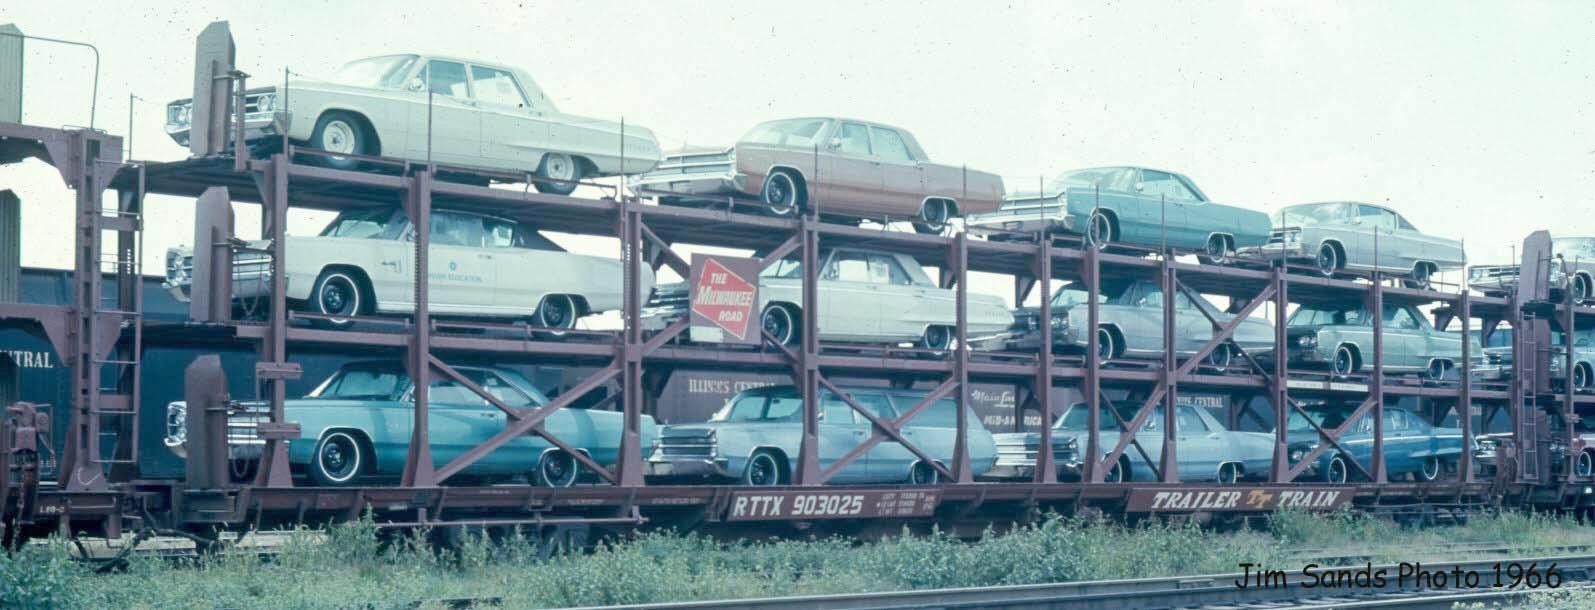 Enchanting Old Car Dealership Pattern - Classic Cars Ideas - boiq.info